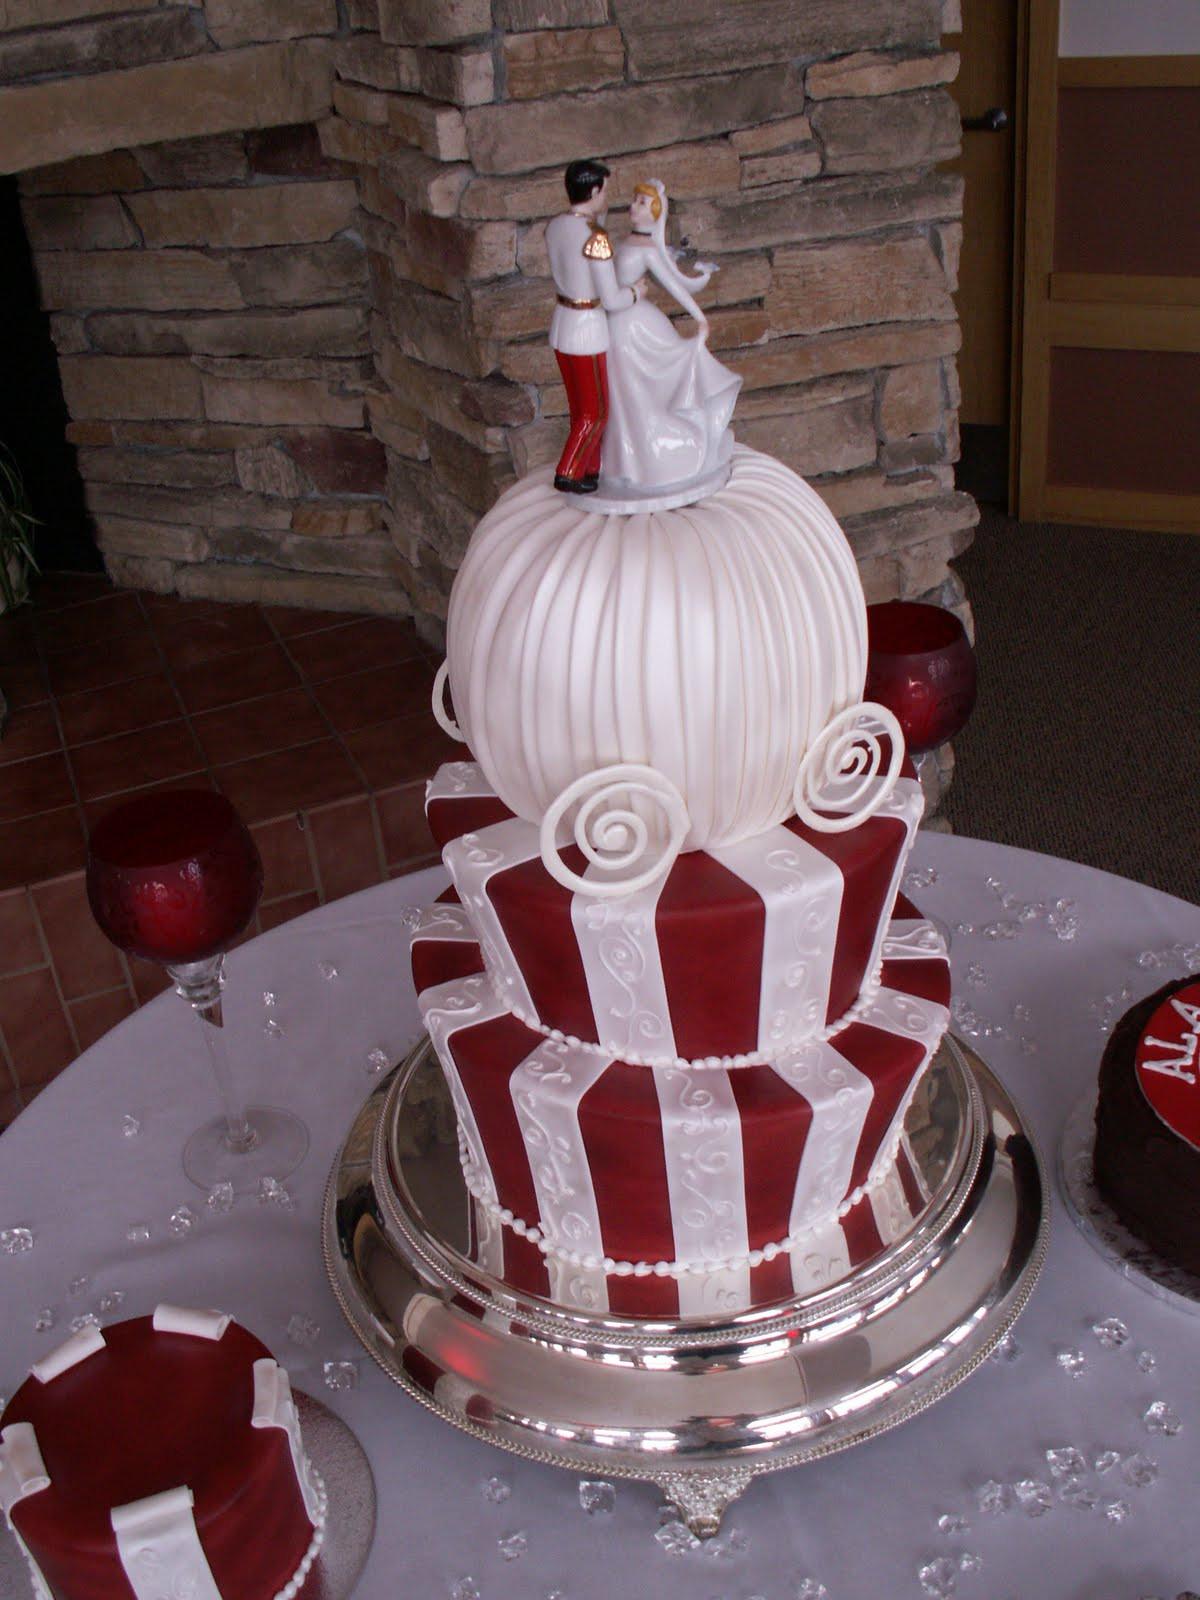 Cinderalla Wedding Cakes  Wedding Cakes Cinderella Wedding Cakes